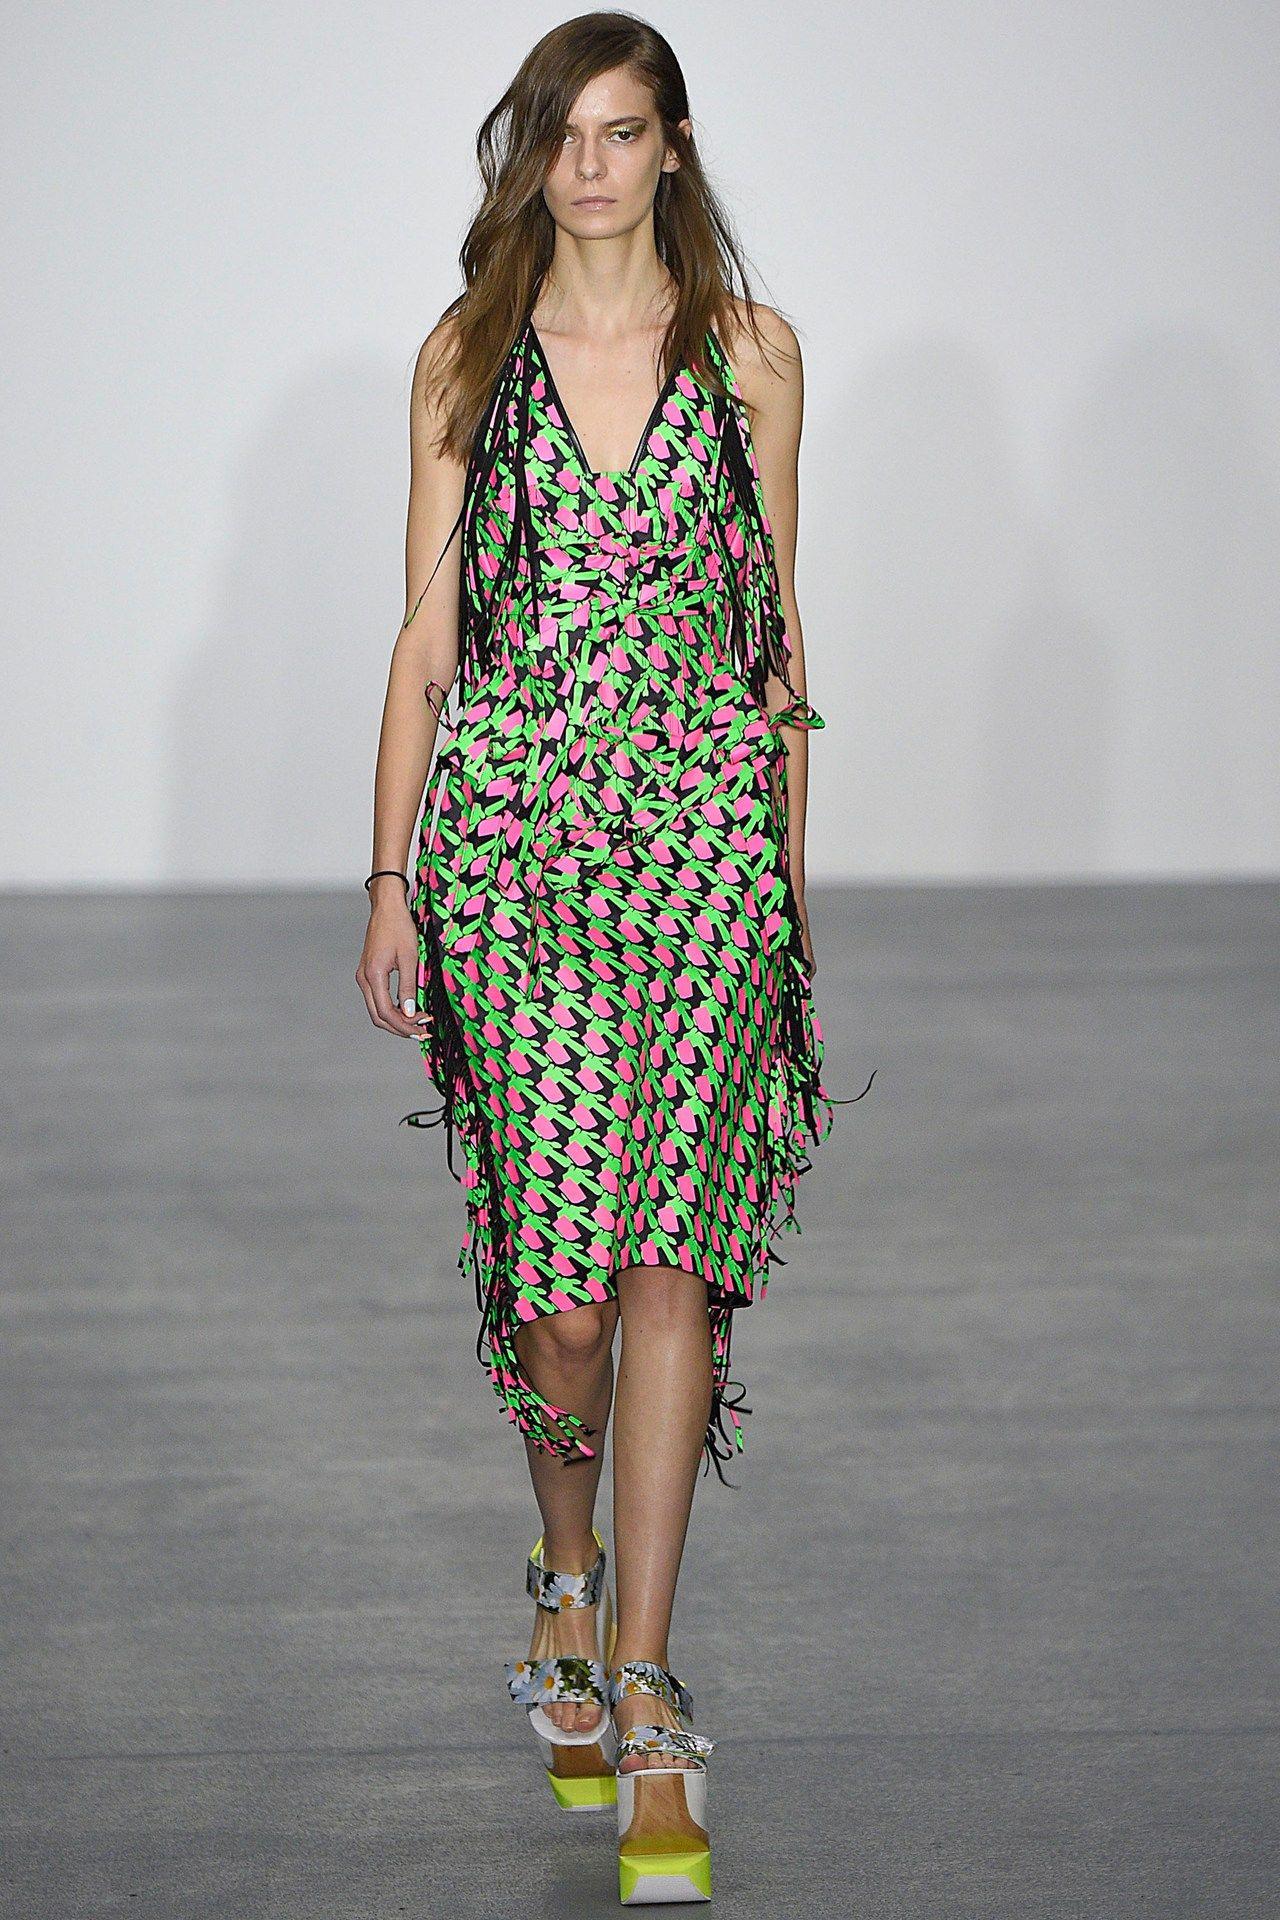 Fyodor Golan  Sommer Kleider Sommerkleidung Damen